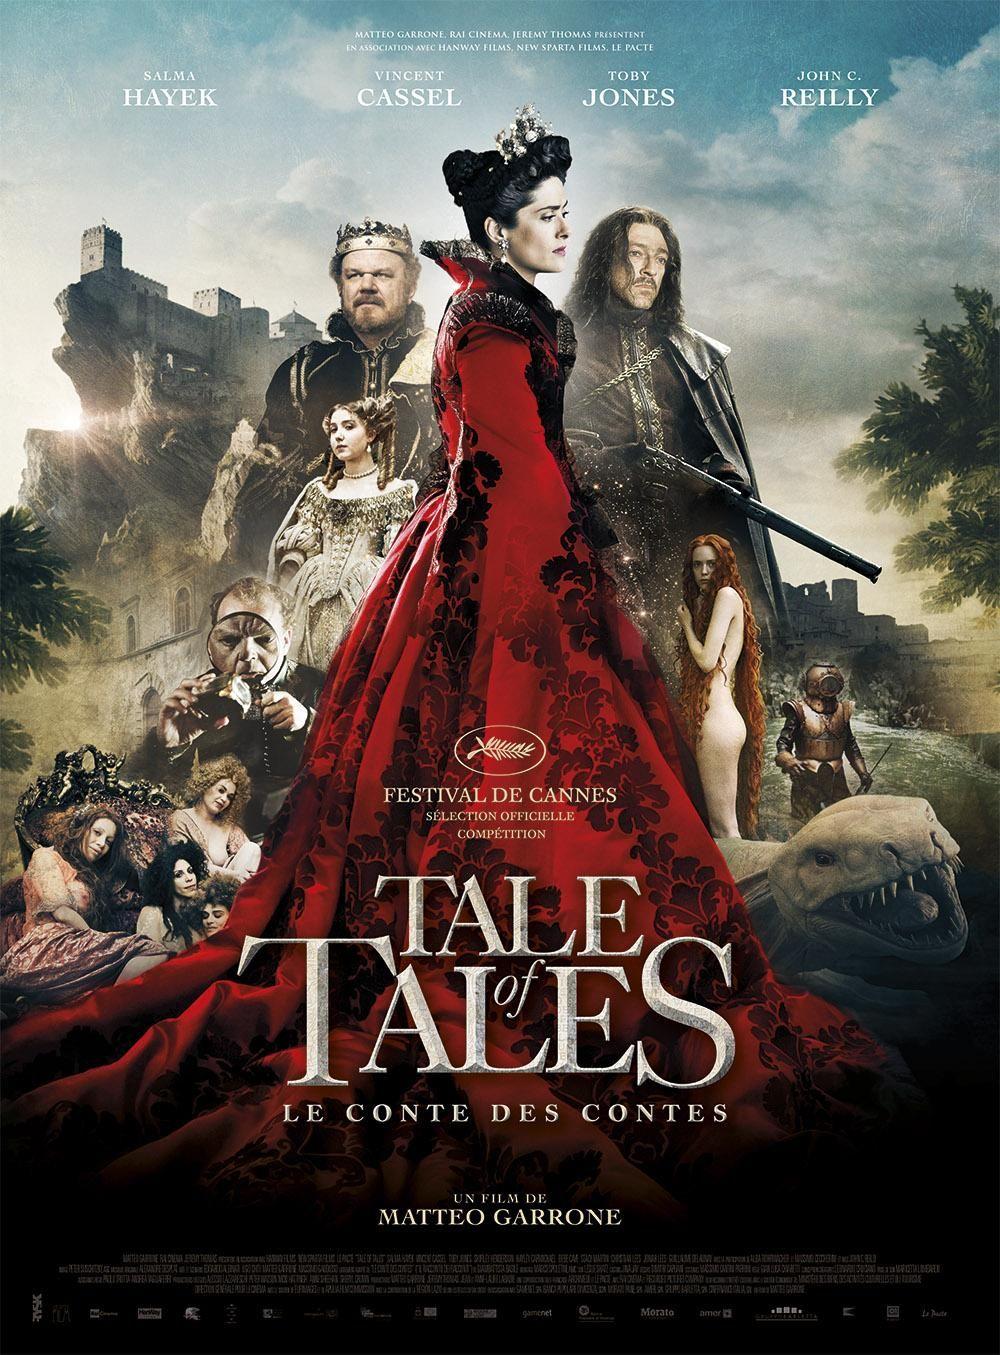 Le Pacte On Filmes Cartazes De Filmes E Filmes Completos Online